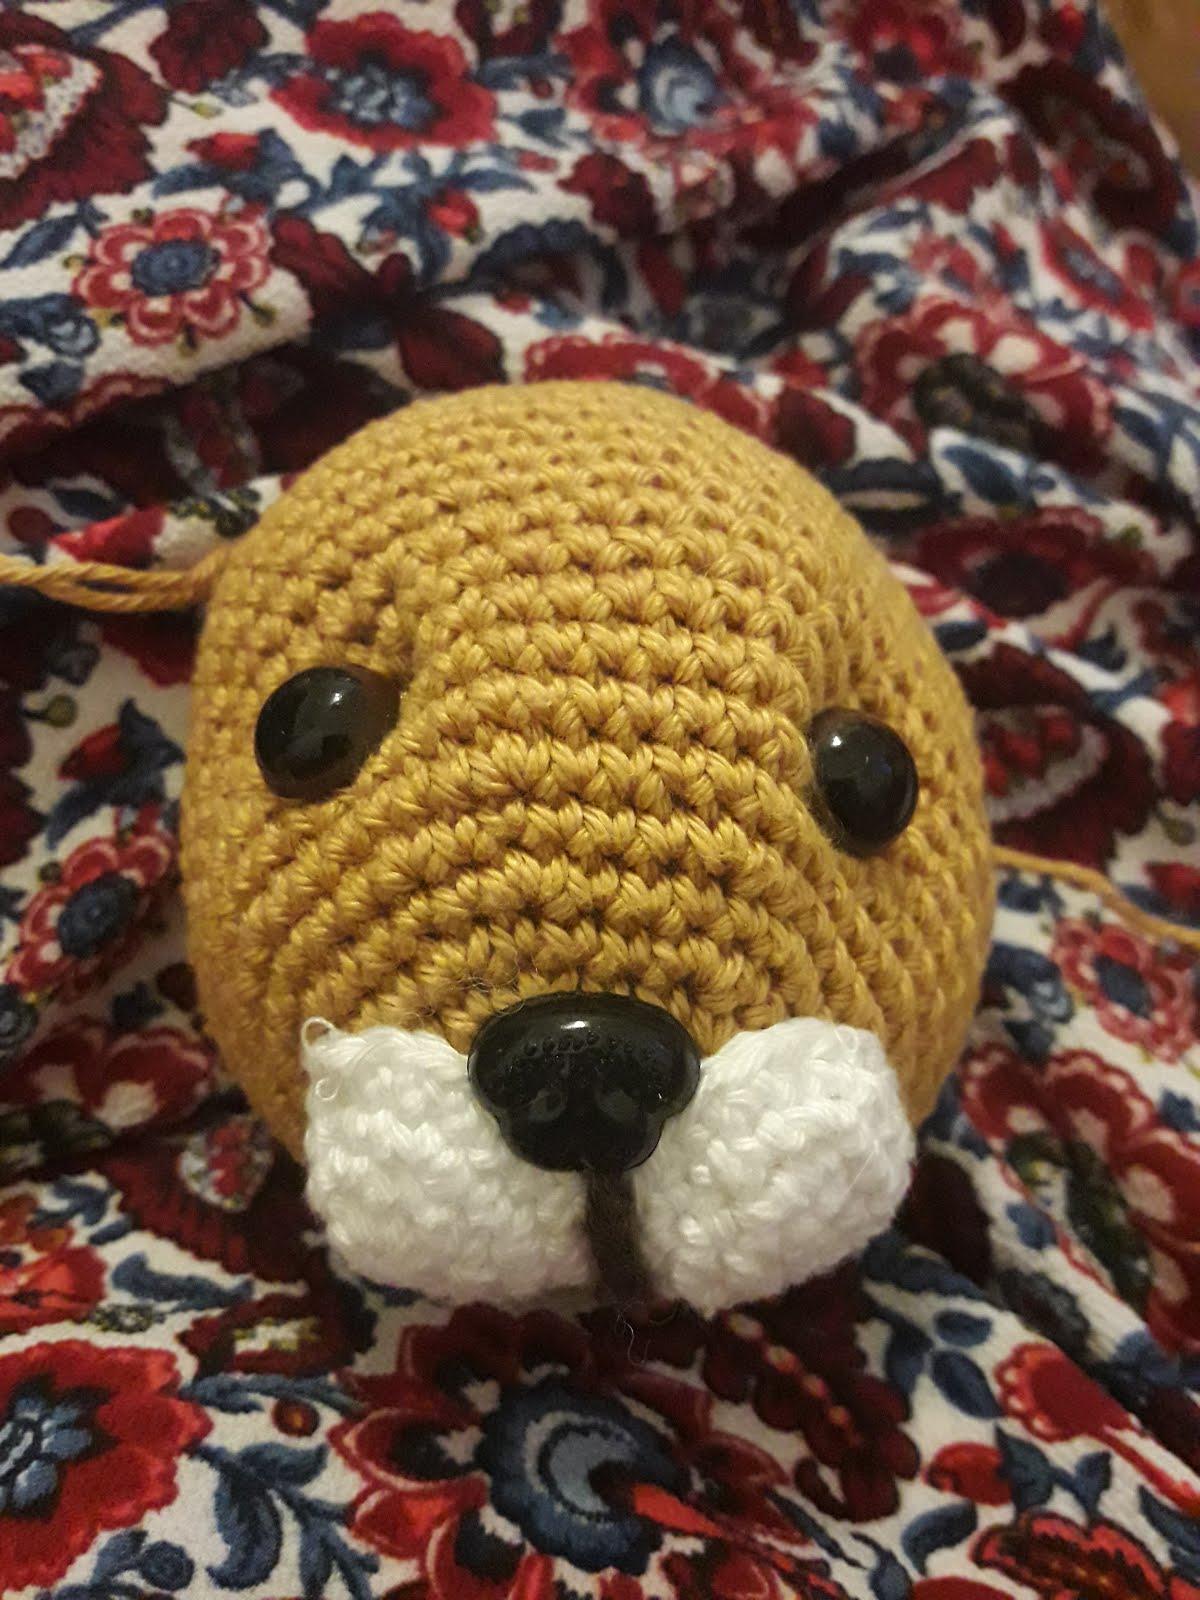 Little Lion Amigurumi: Free and easy crochet pattern   1600x1200